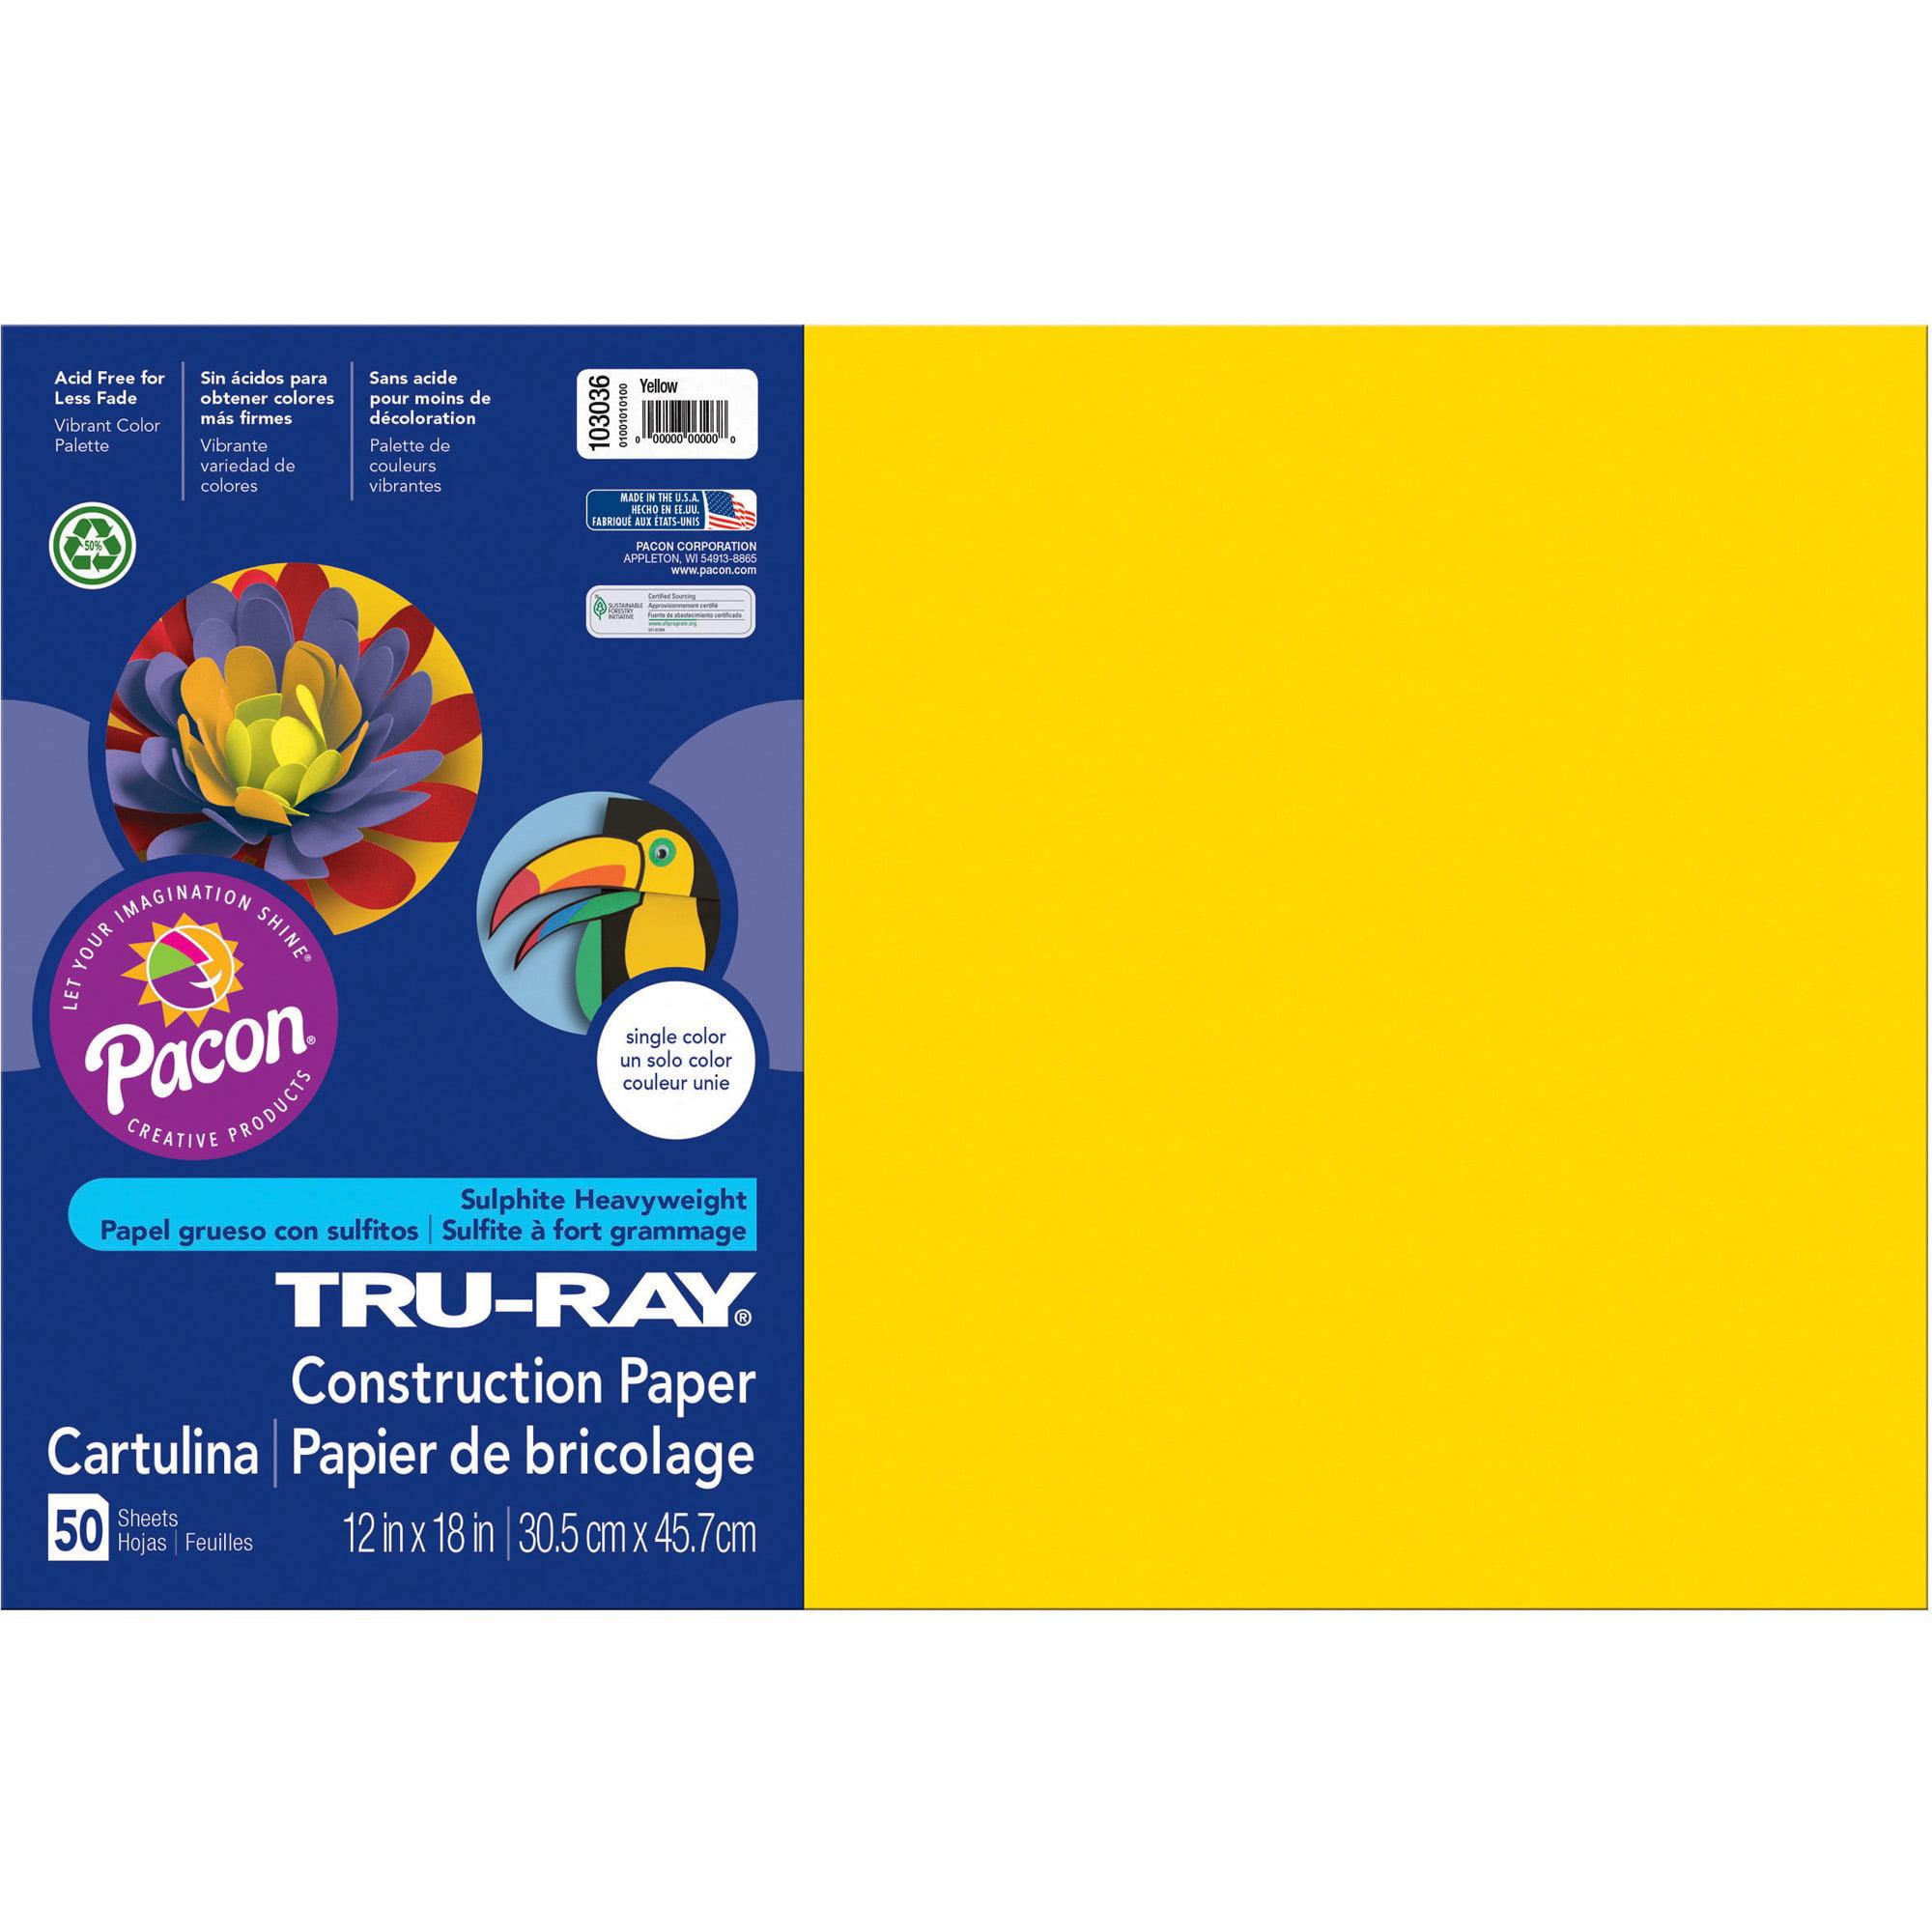 "Tru-Ray Construction Paper, Yellow, 12"" x 18"", 50 Sheets"